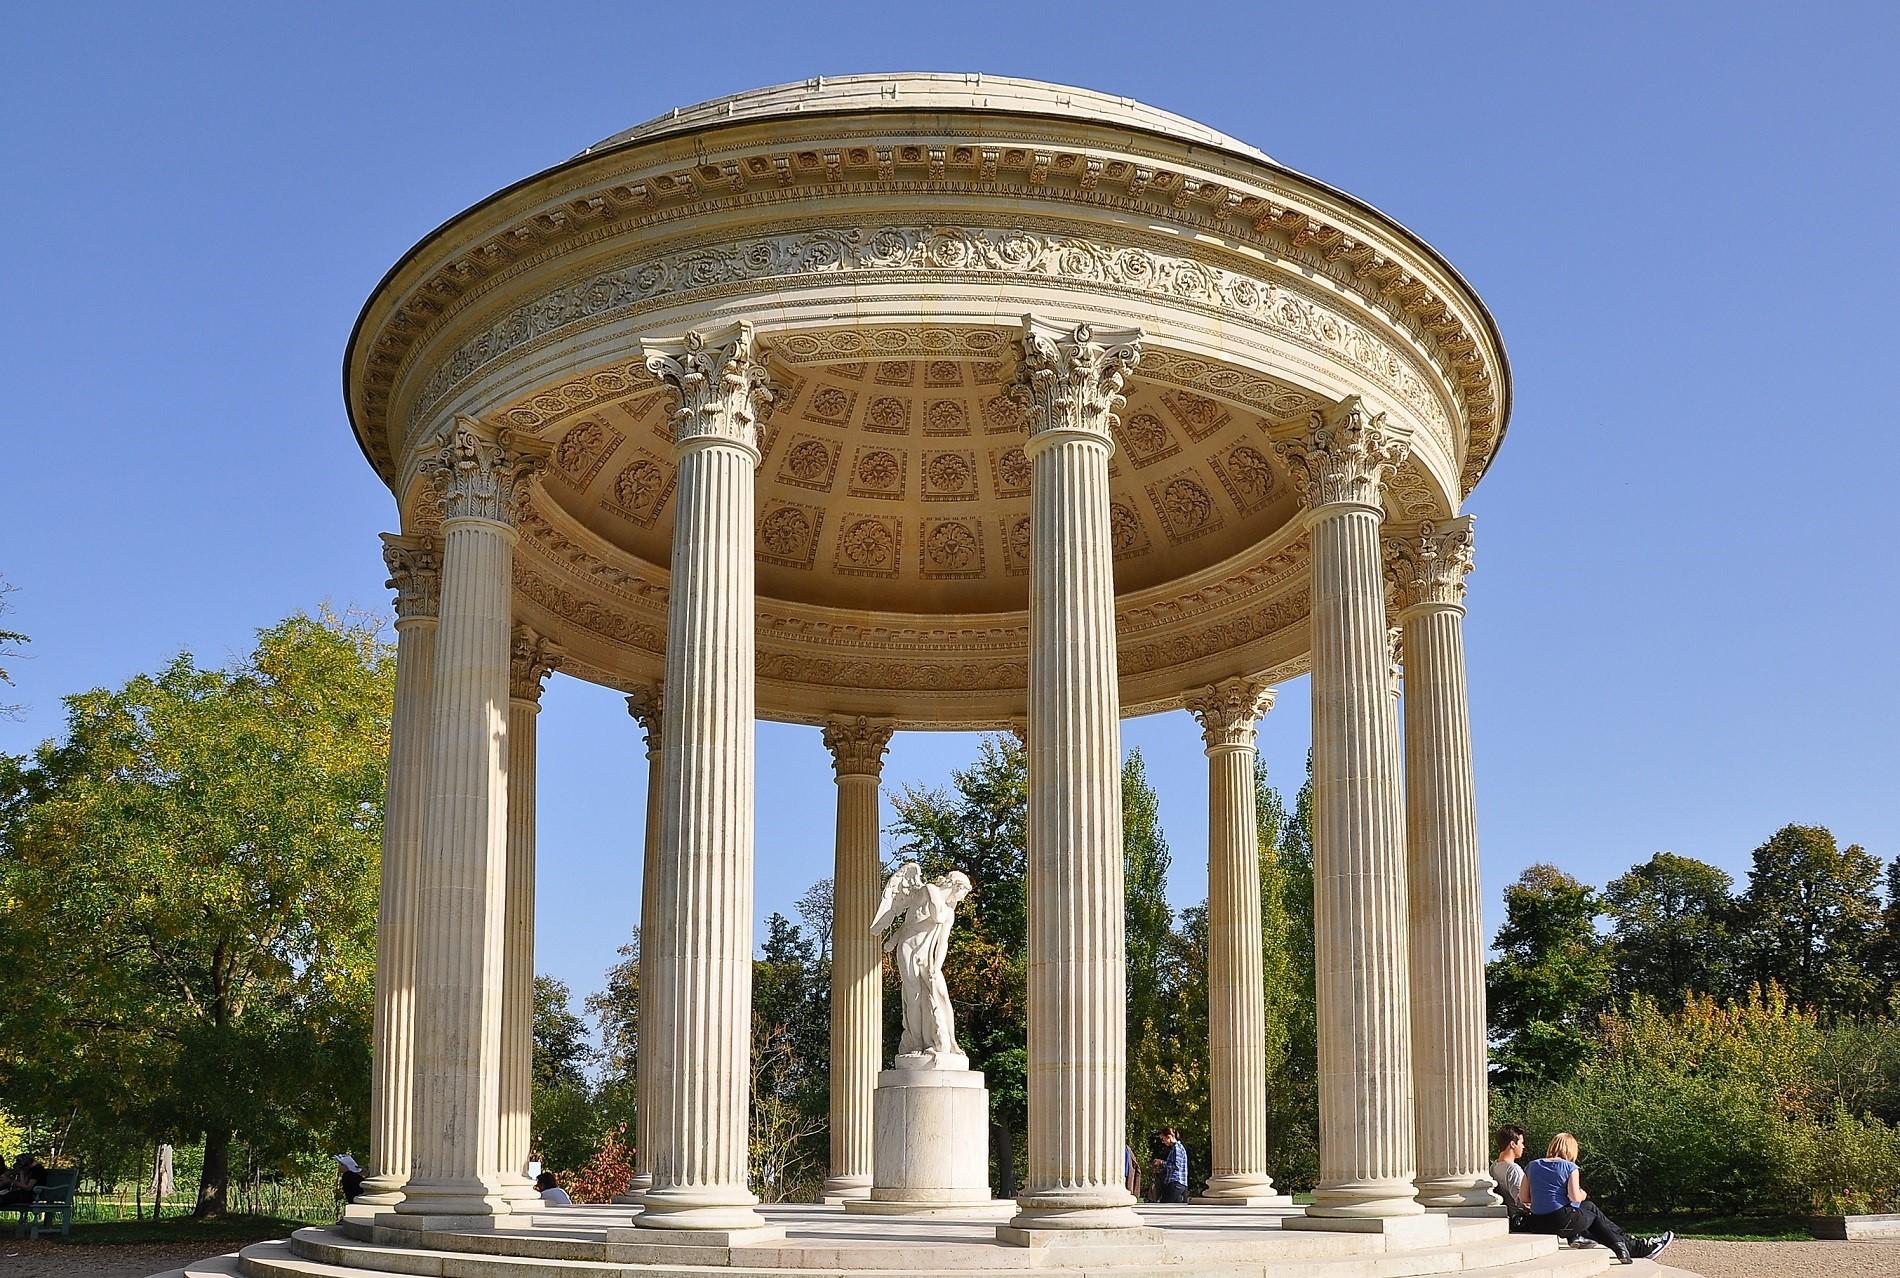 Templul grecesc din incinta Grădinii Engleze din Munchen